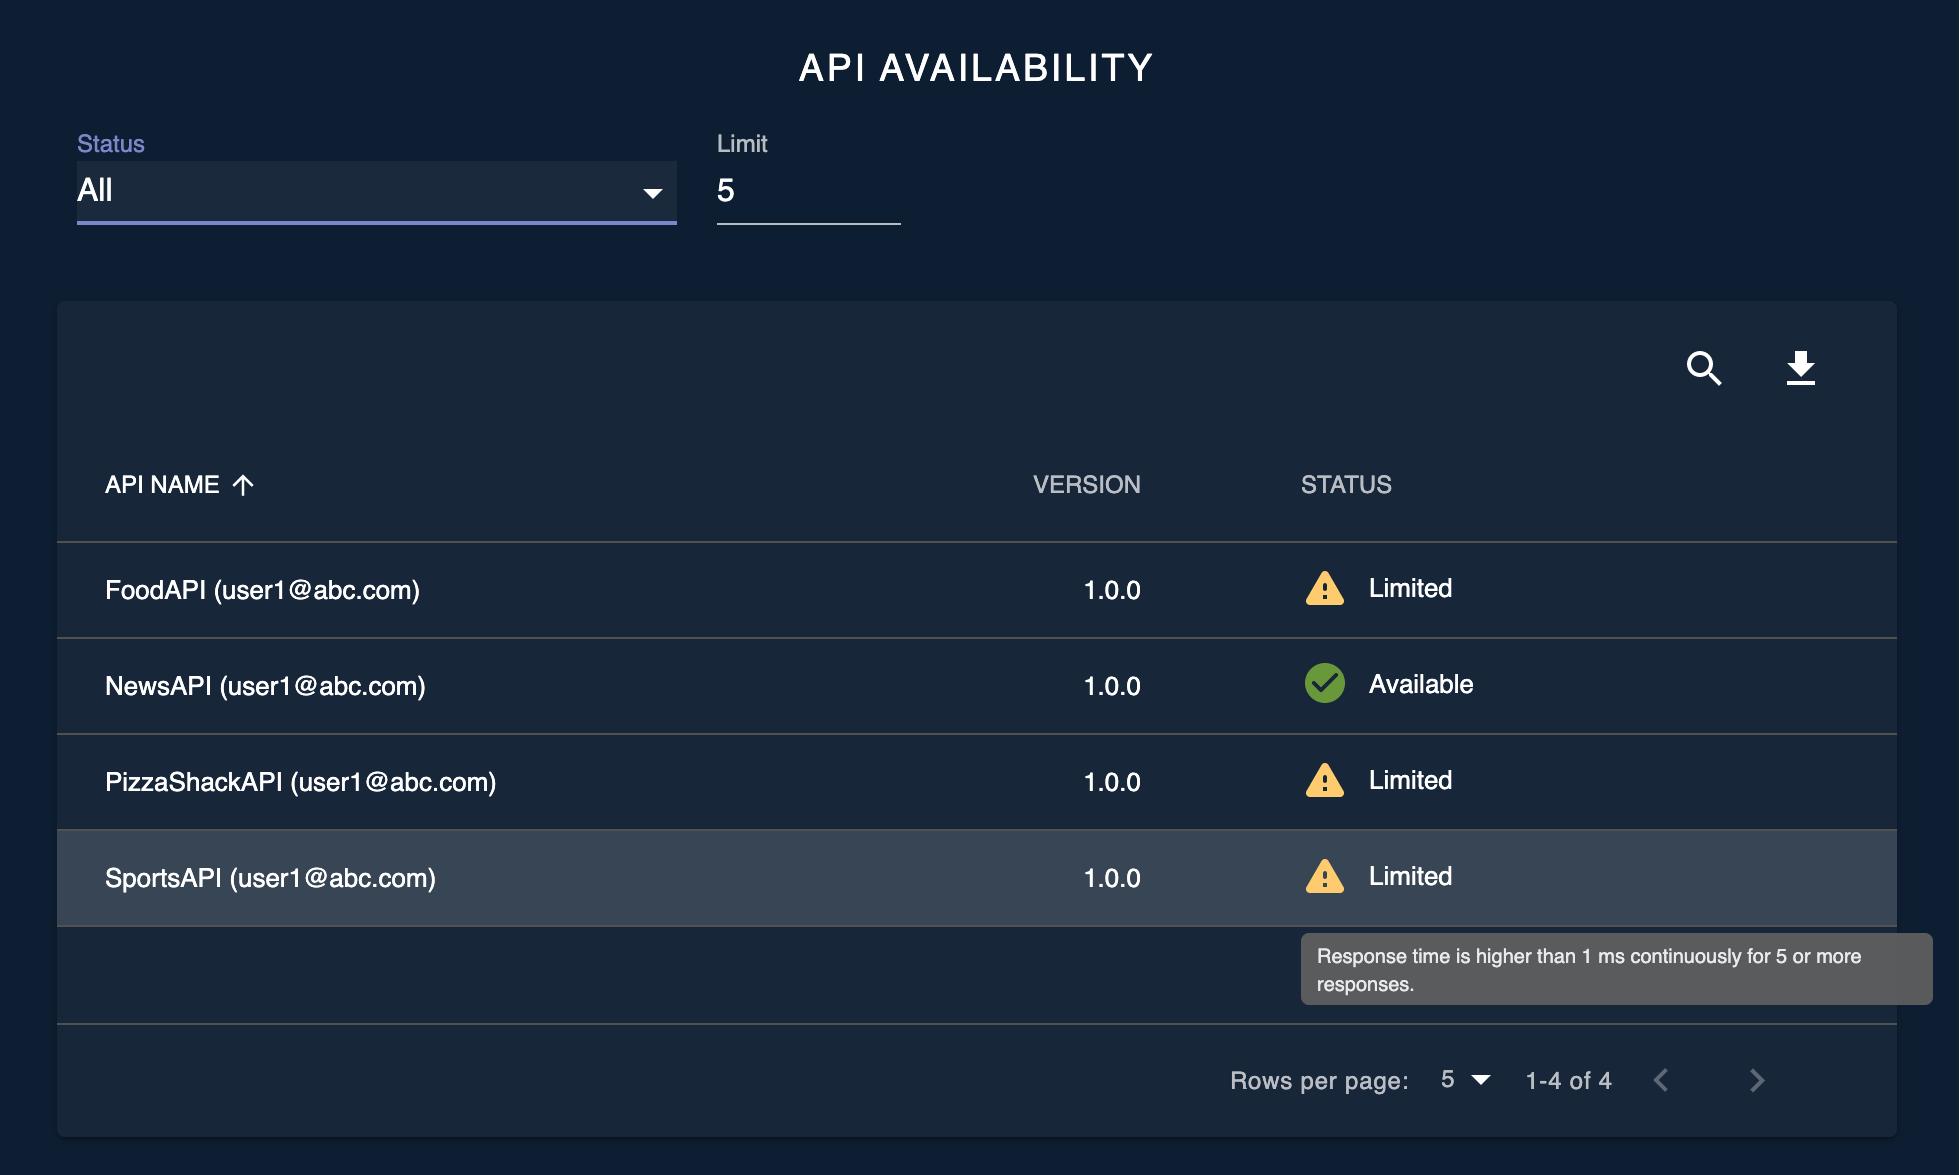 API availability